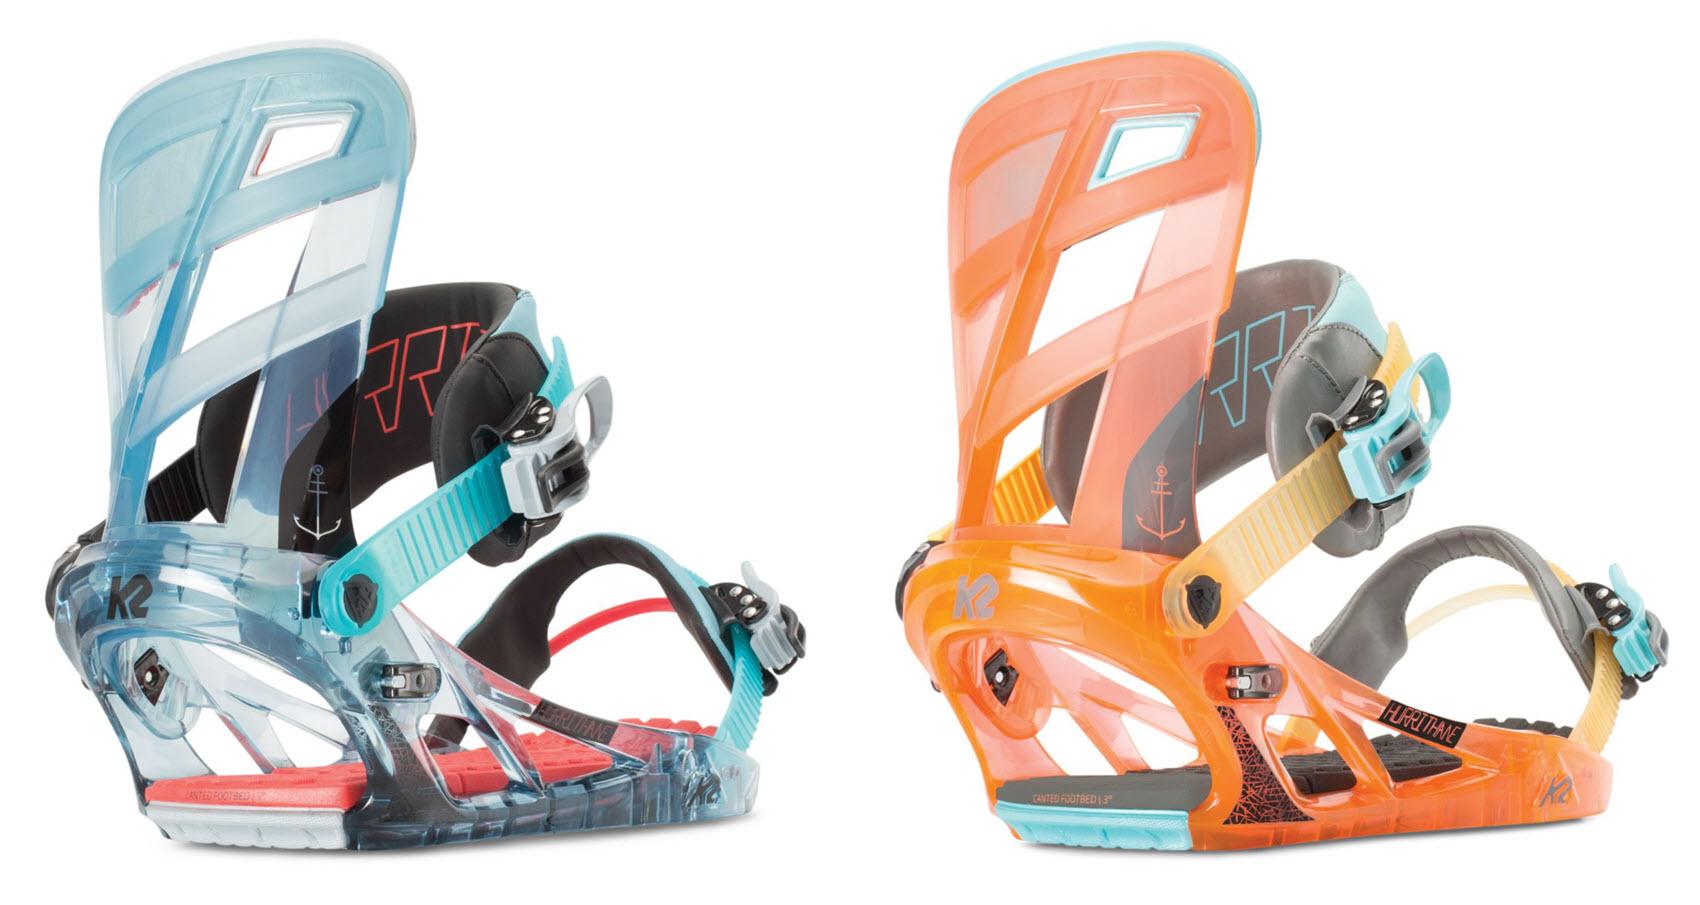 2 Hurrithane Park Canted Soft Freestyle K2 Snowboard Binding Tweekback